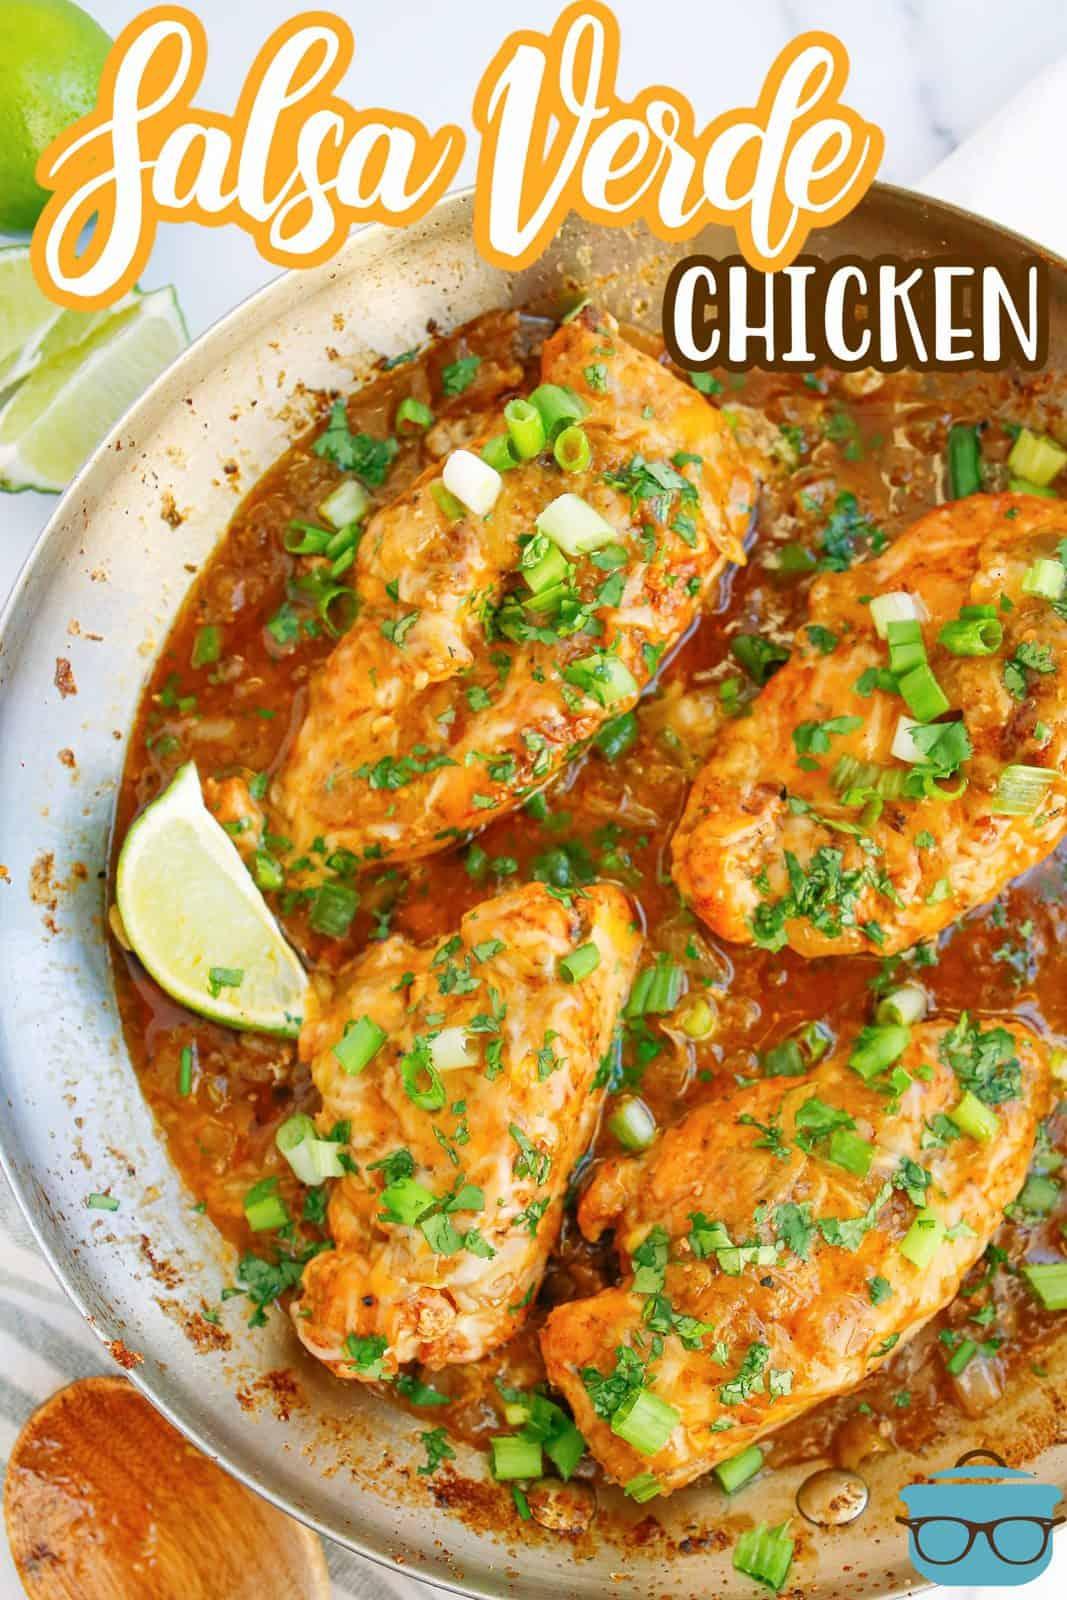 Pinterest image of Salsa Verde Chicken Recipe in skillet with garnishes.